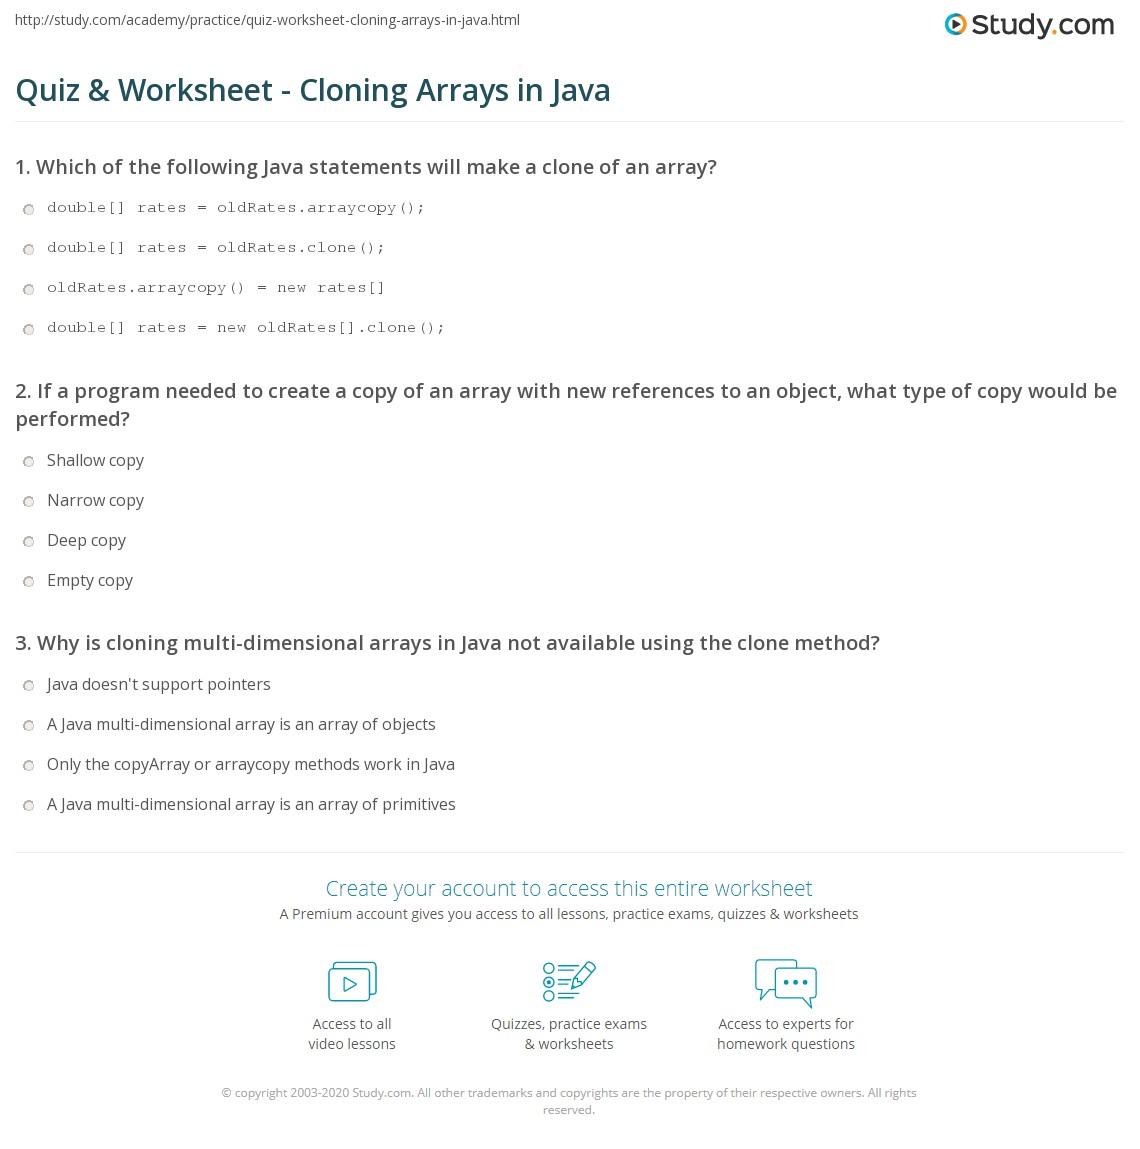 Quiz & Worksheet - Cloning Arrays in Java | Study com